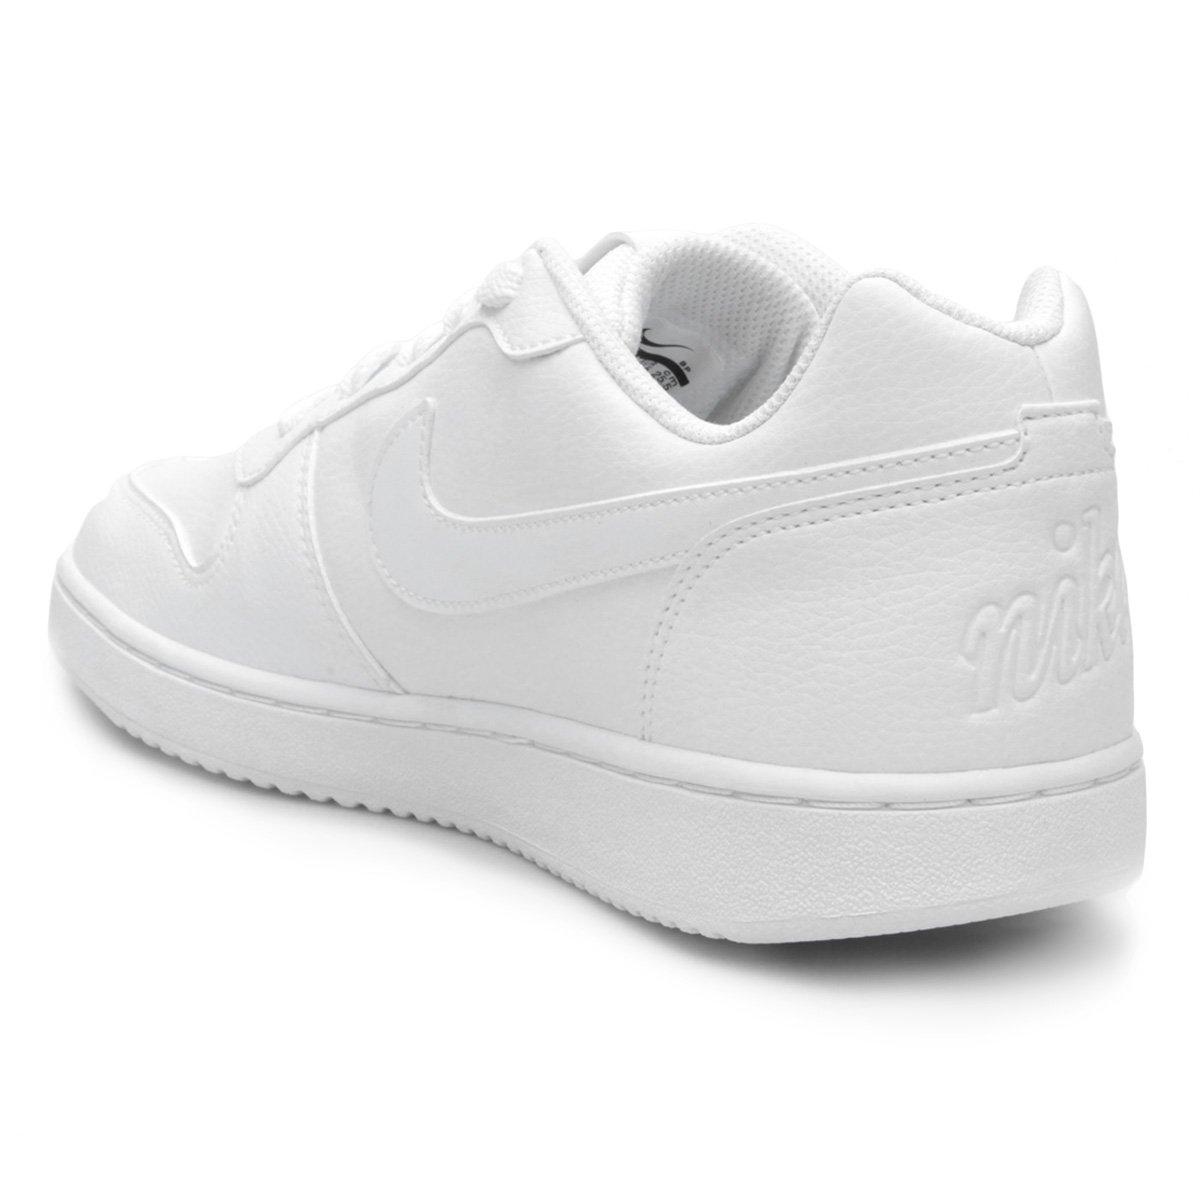 87ed037562d7e ... Tênis Nike Ebernon Low Masculino - Branco. COLLECTION  LANÇAMENTO